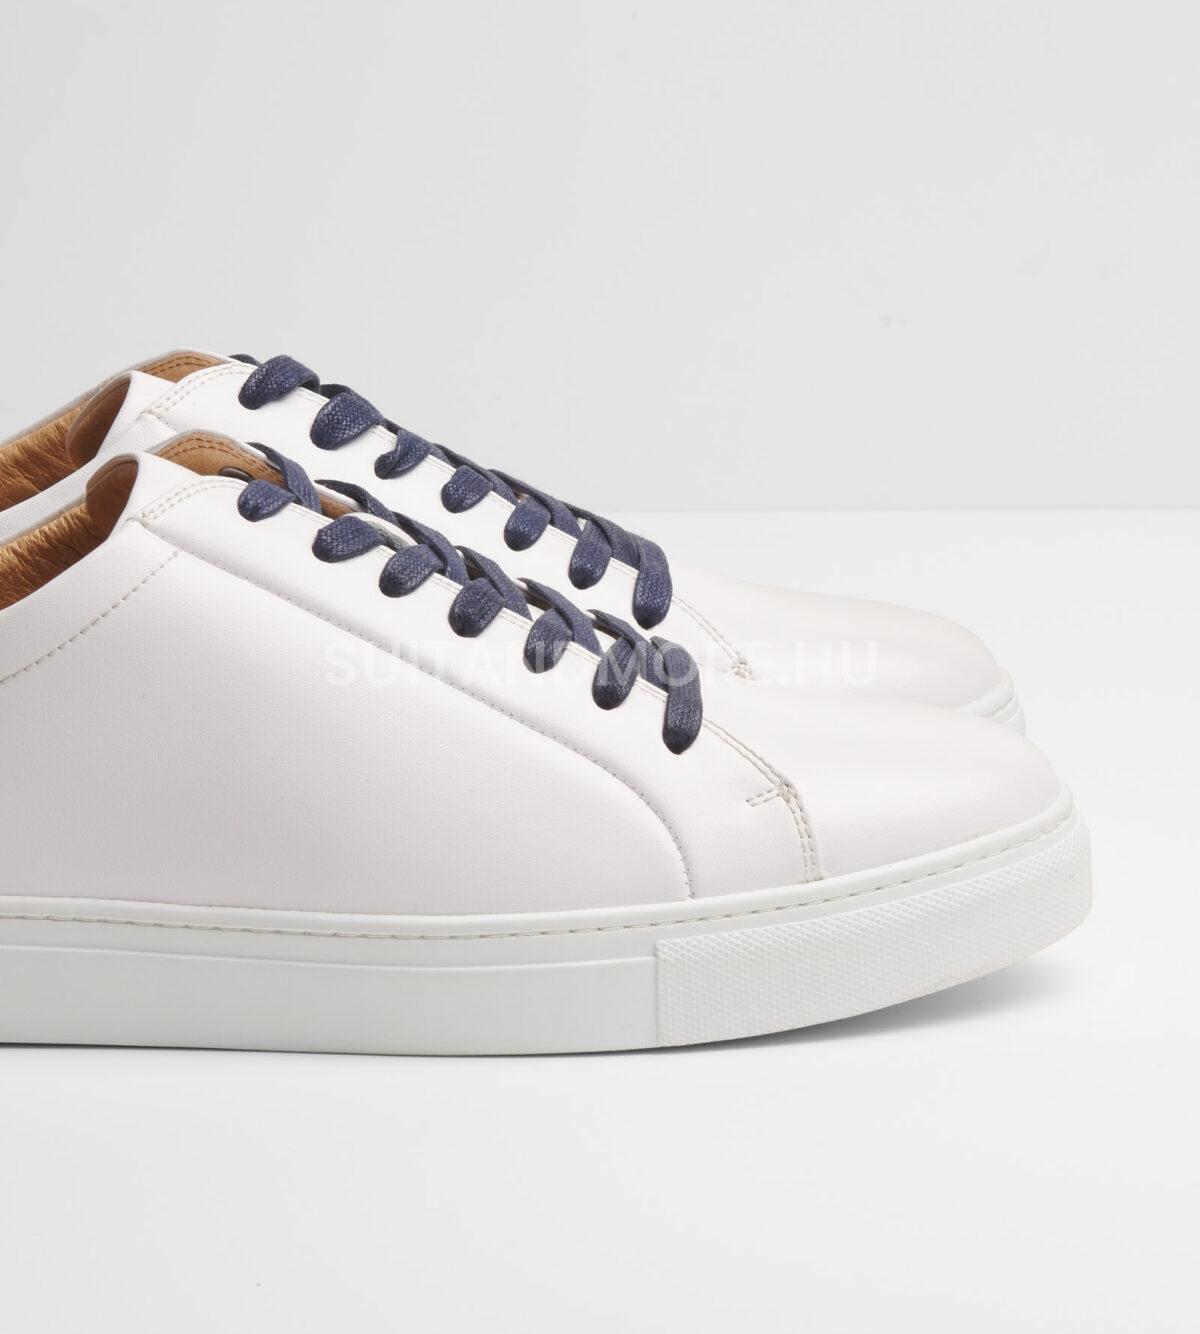 digel-feher-sneaker-cipo-seth-1199716-80-02